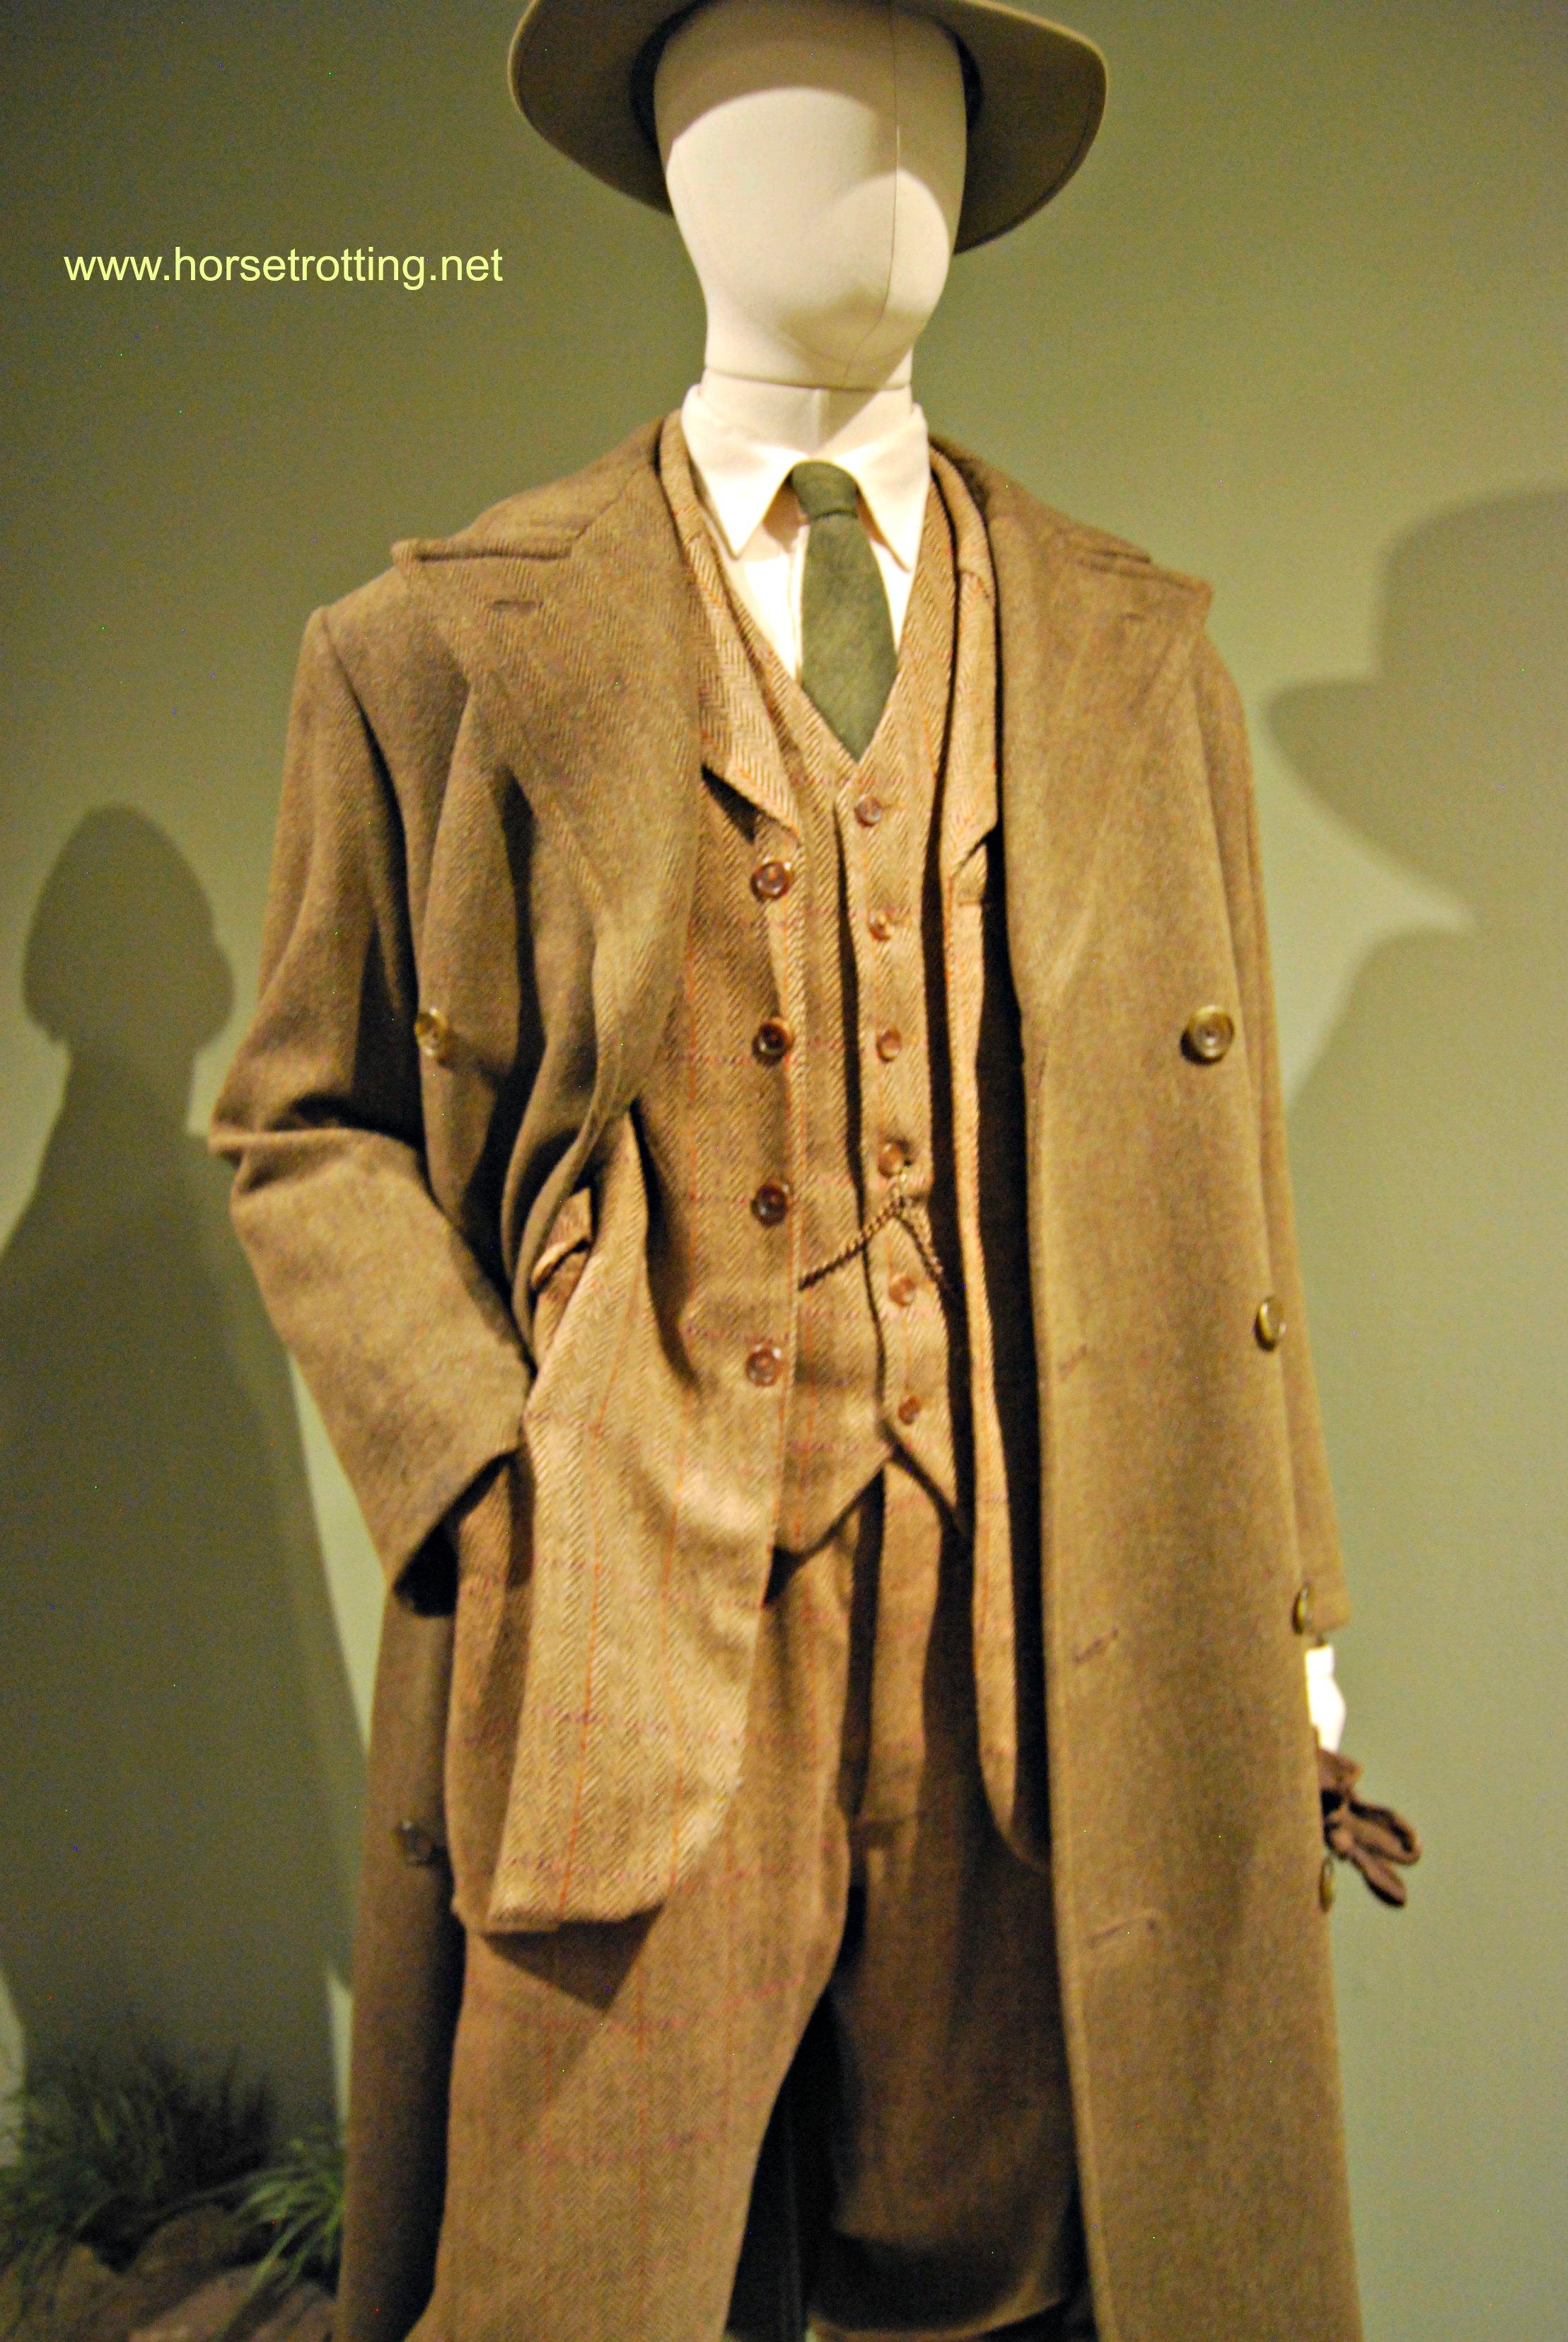 Downton Abbey Costume horsetrotting.net